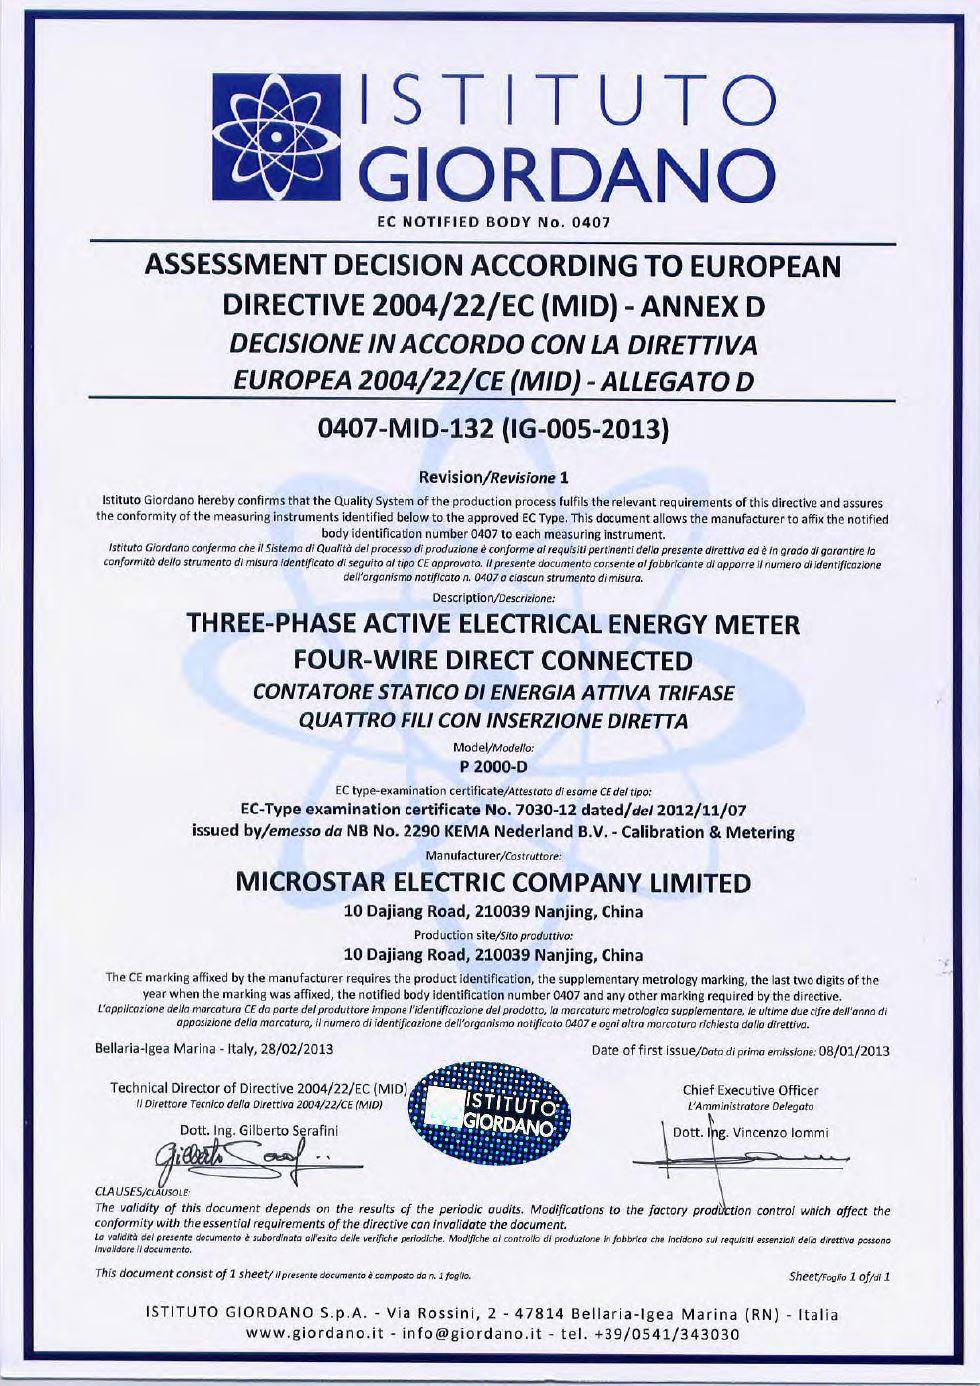 P2000-D MID Module D Certificate